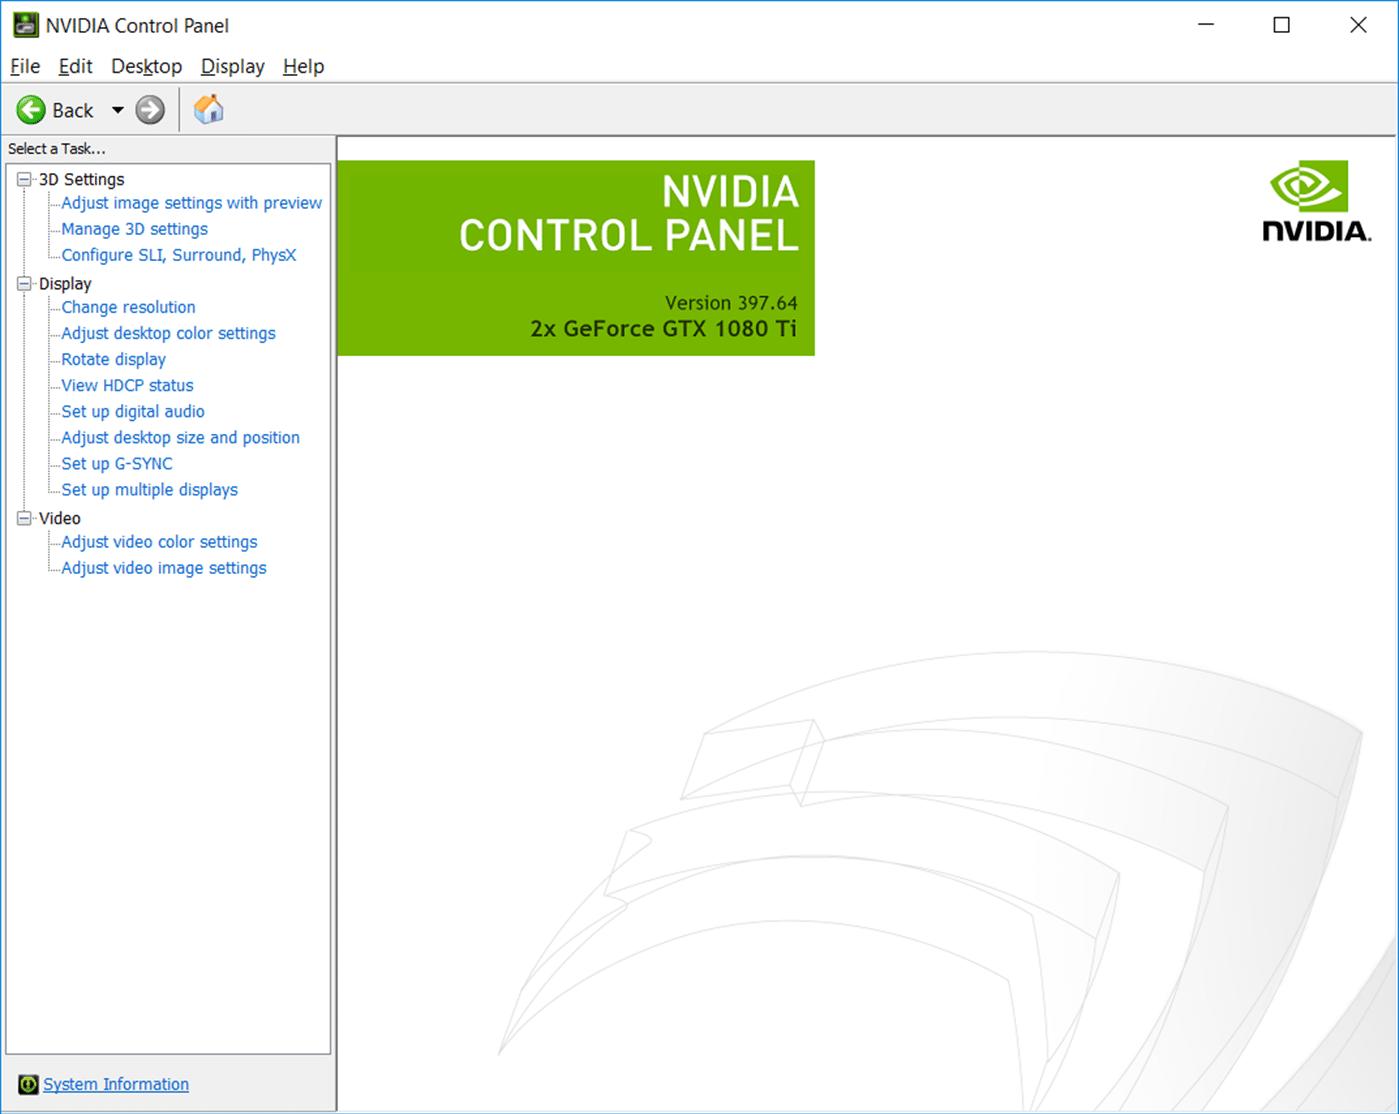 nvidia control panel windows 10 store